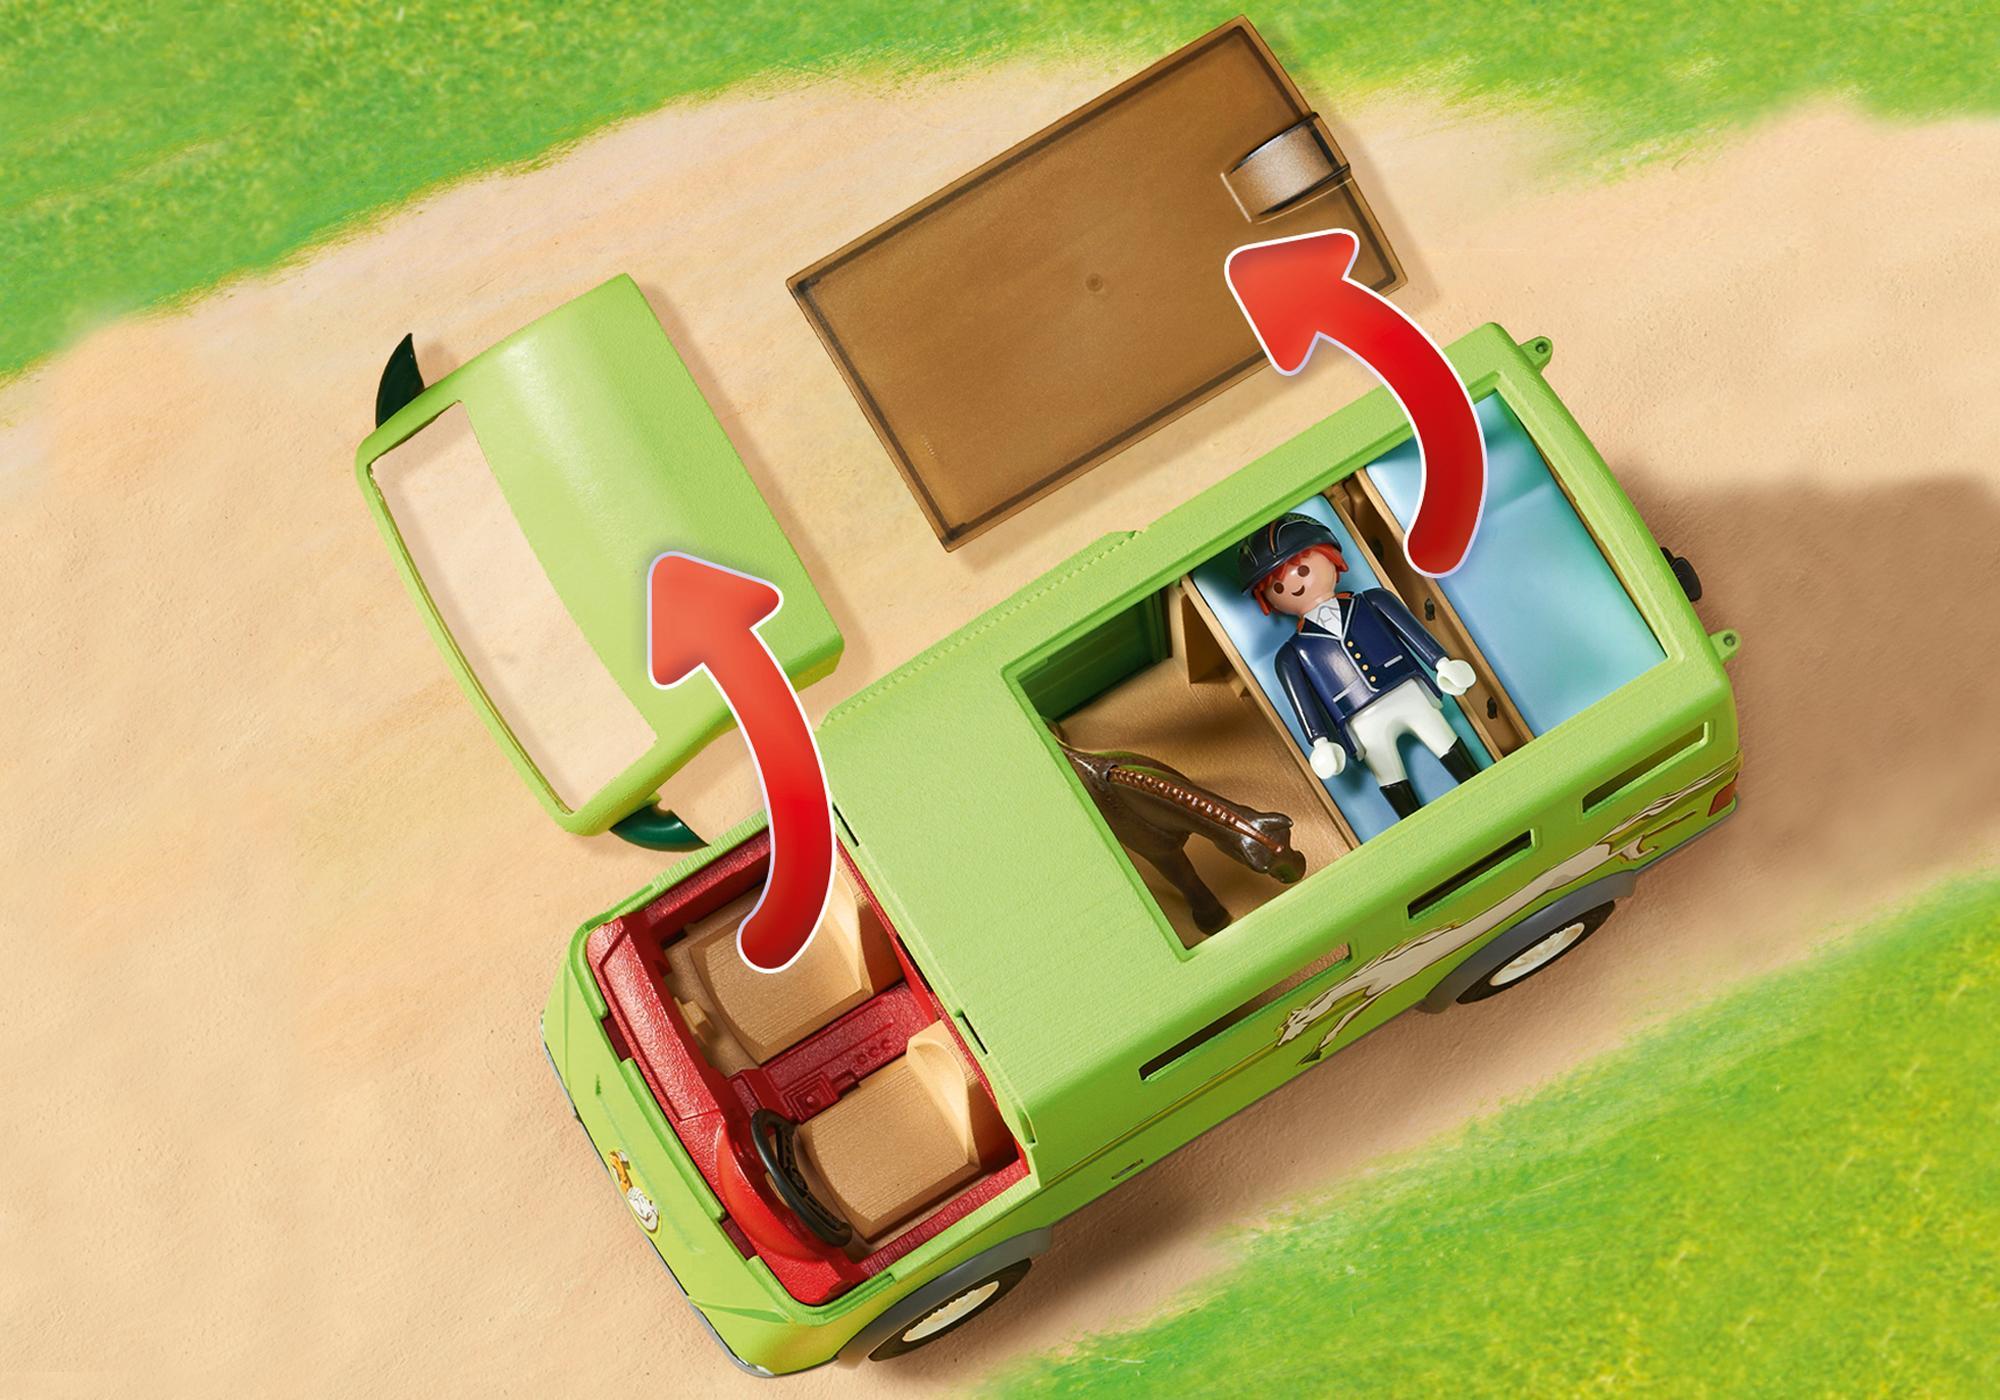 http://media.playmobil.com/i/playmobil/6928_product_extra1/Paardenvrachtwagen